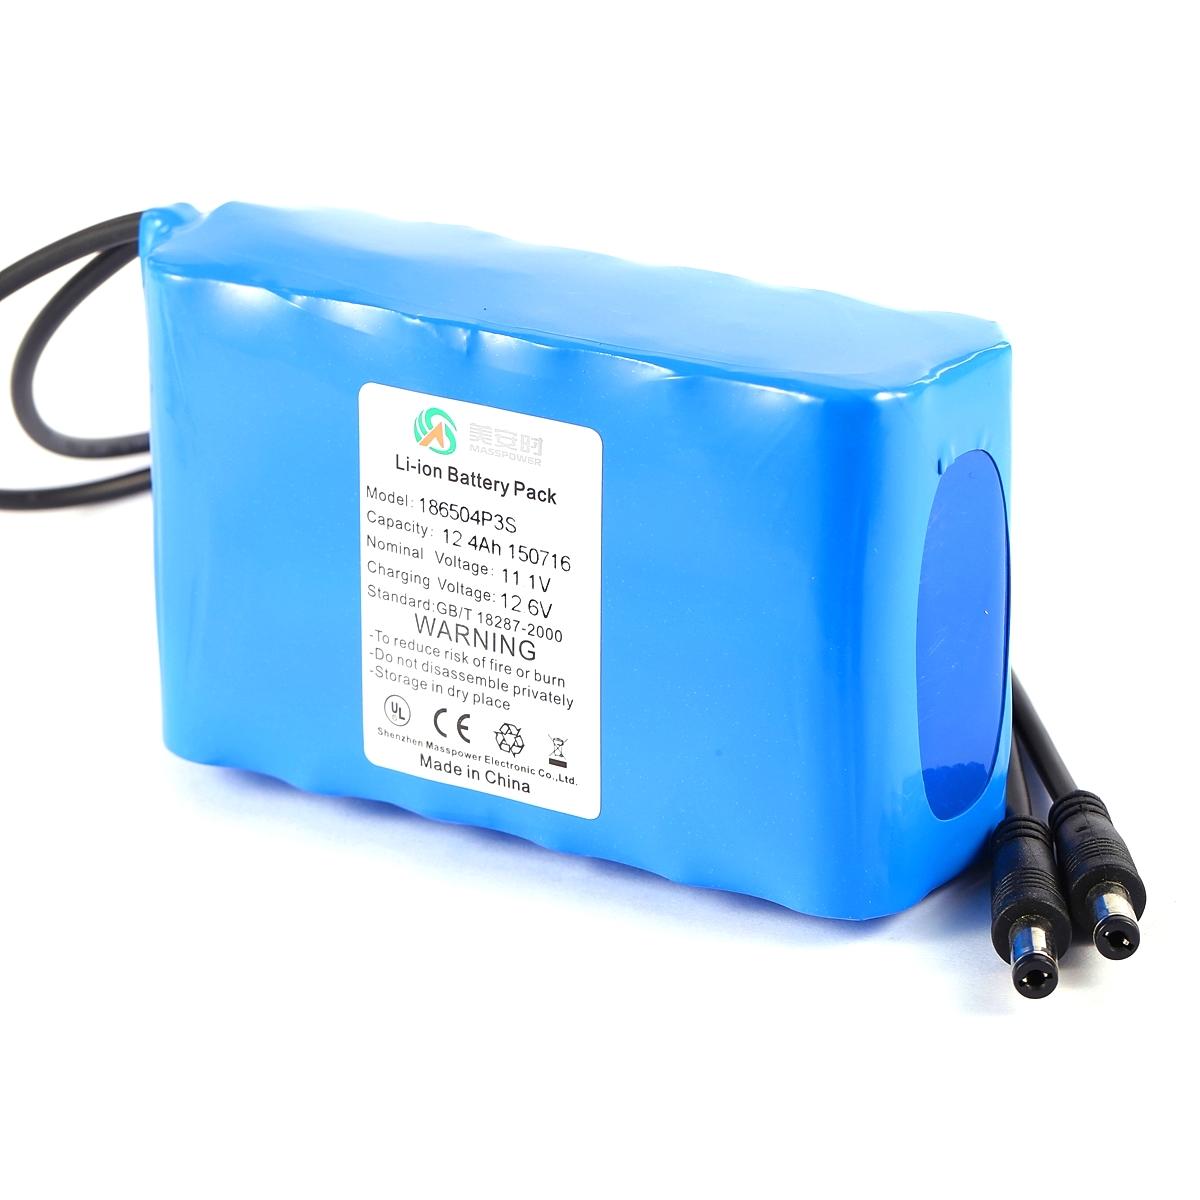 11.1V锂电池组丨便携采样器